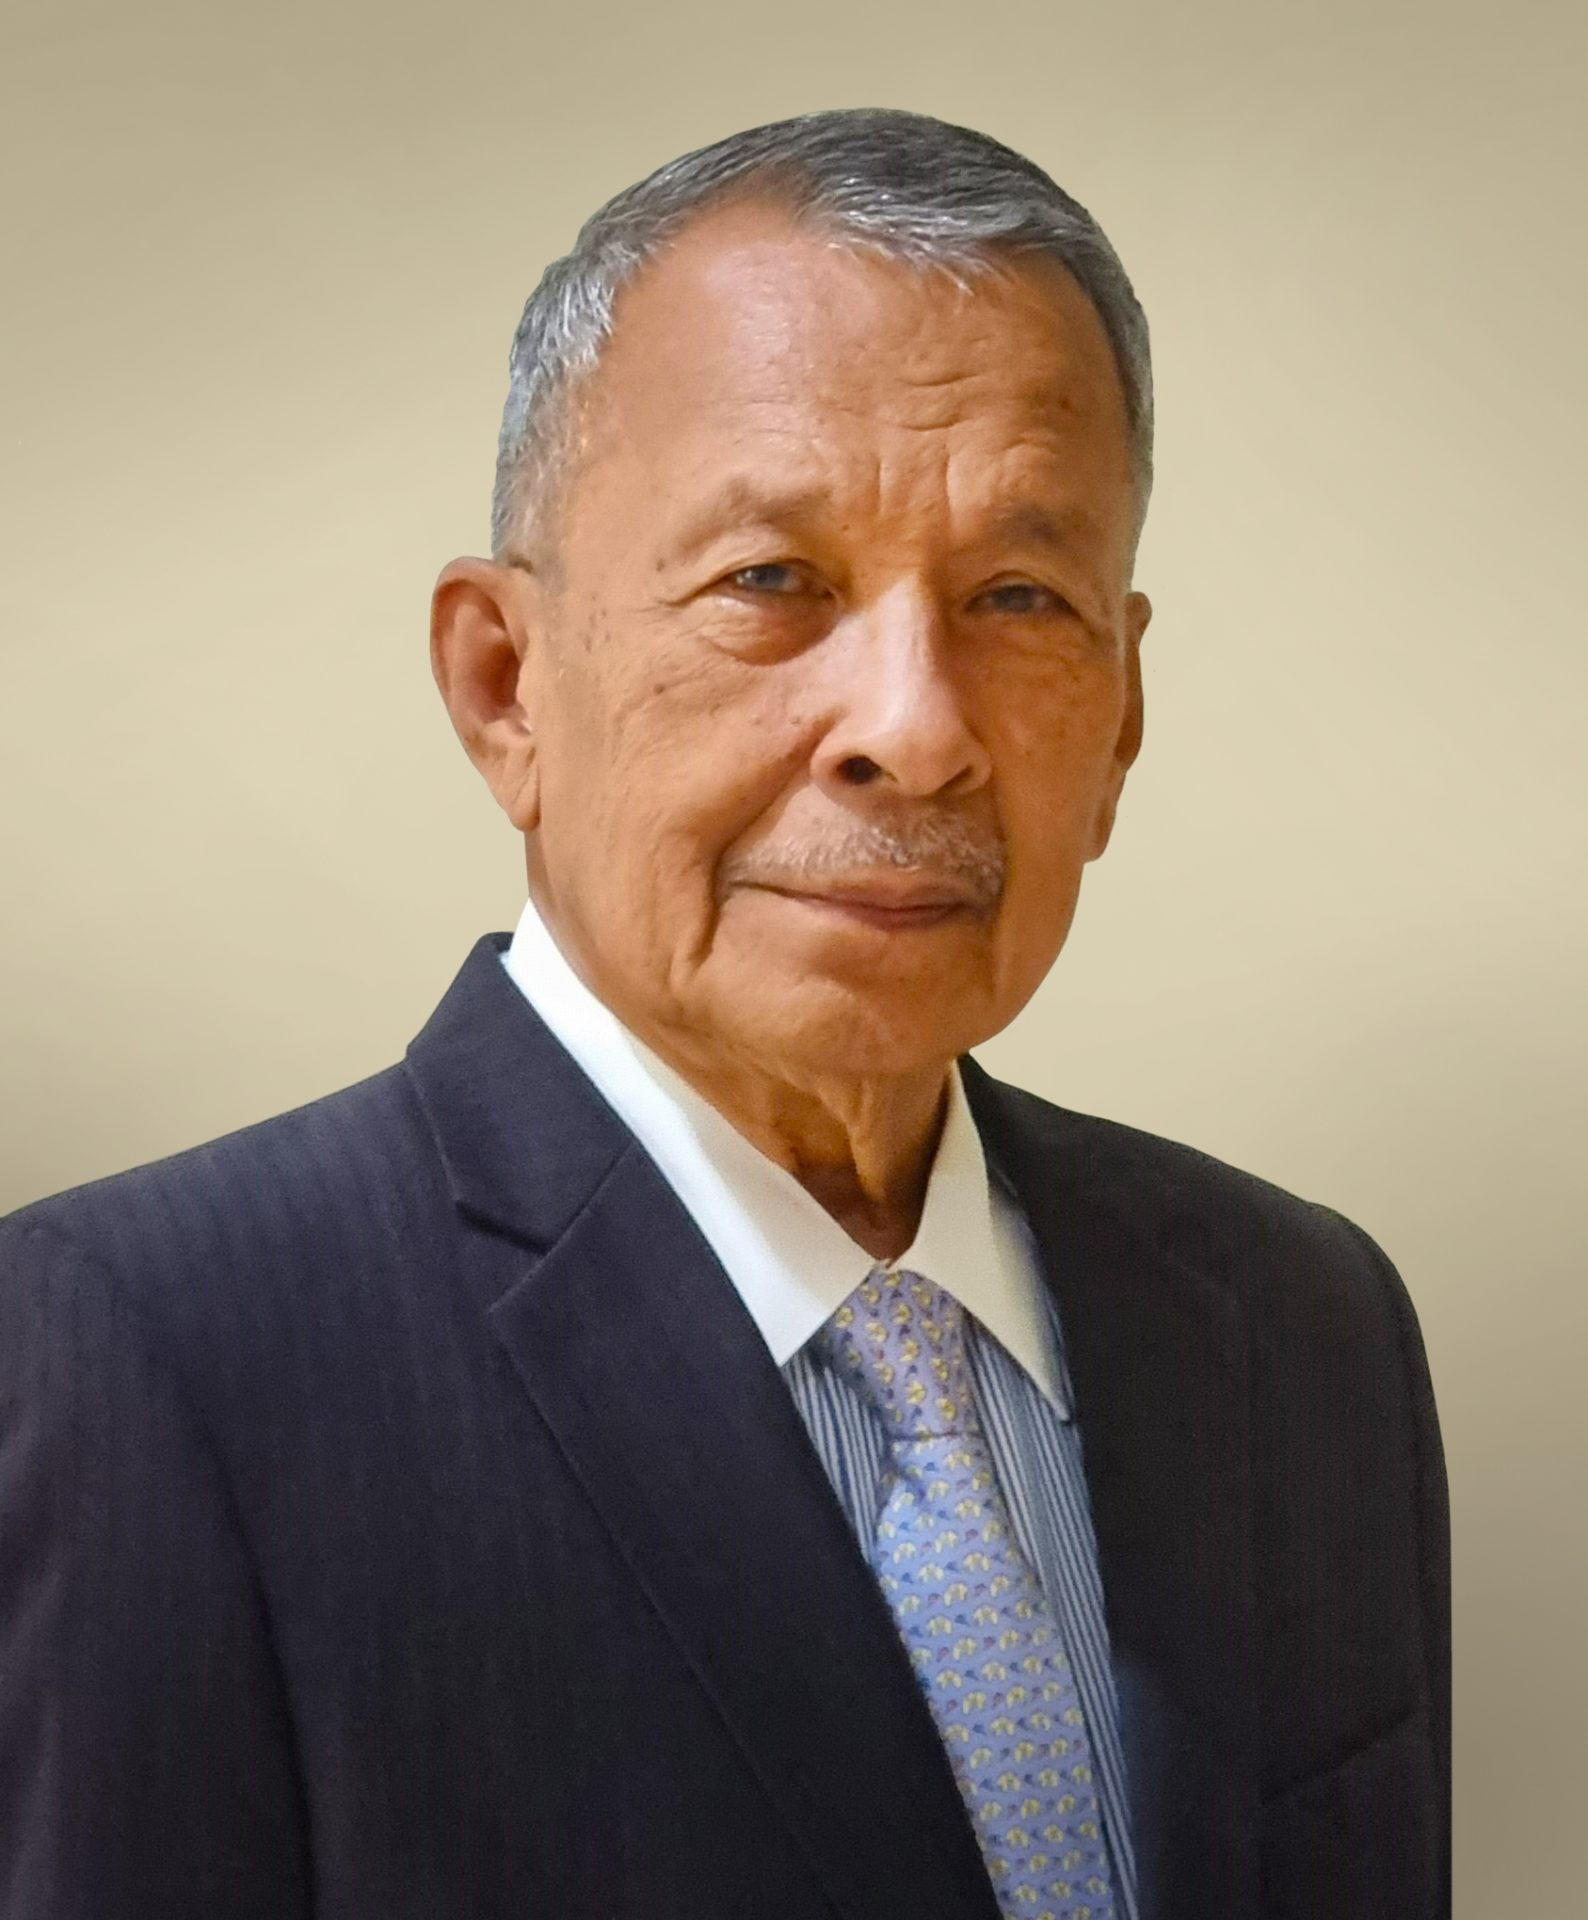 Tan Sri Dato Mohd Ismail bin Che Rus